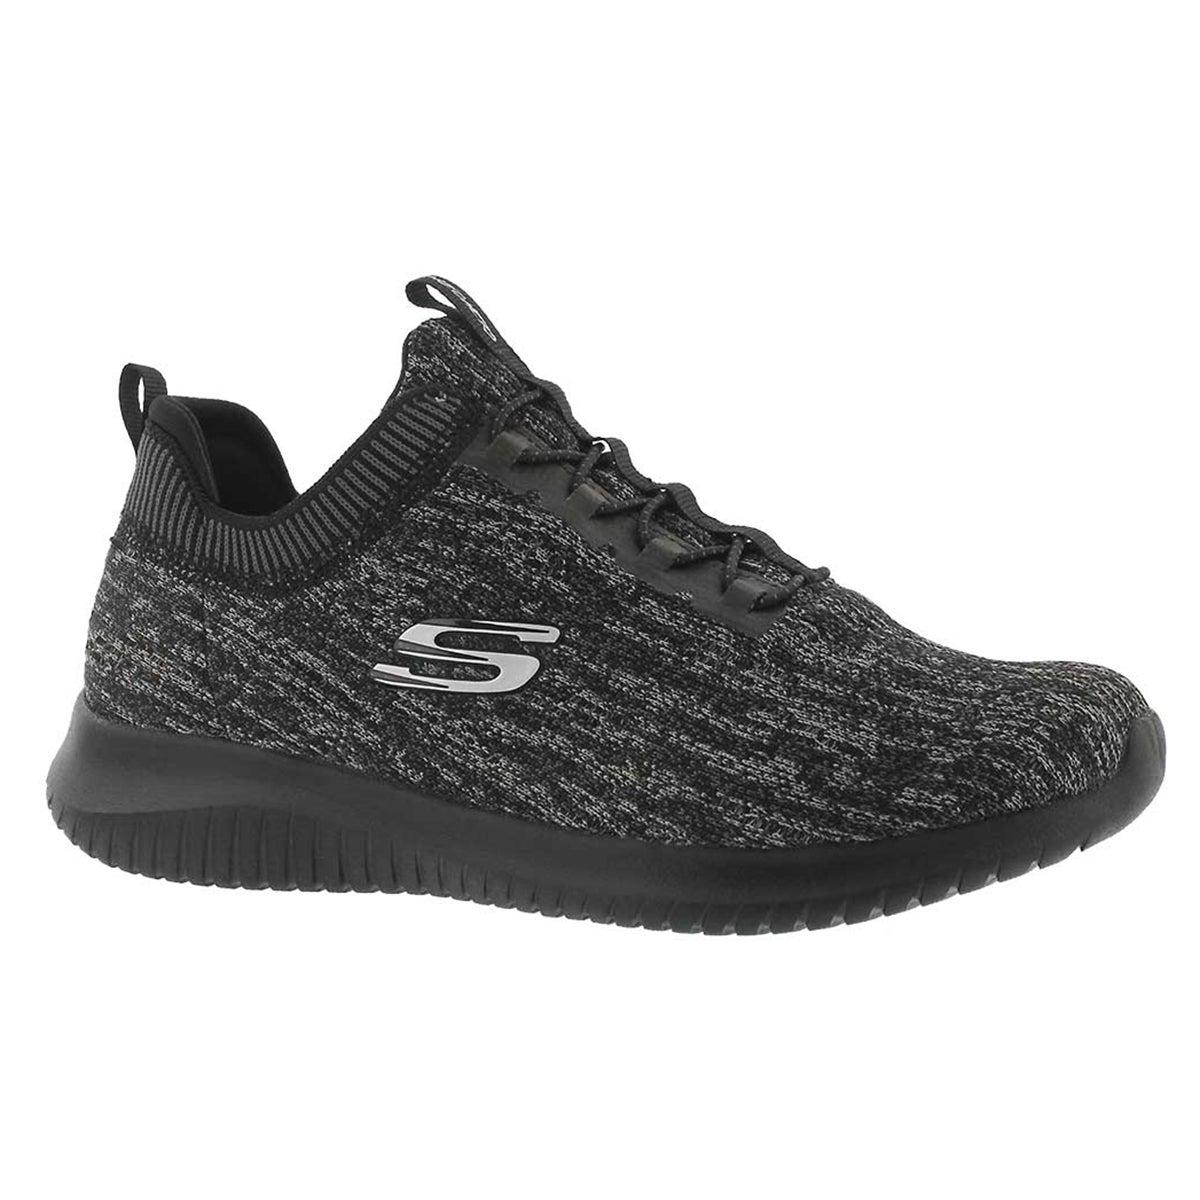 Women's ULTRA FLEX BRIGHT HORIZON blk/blk sneakers